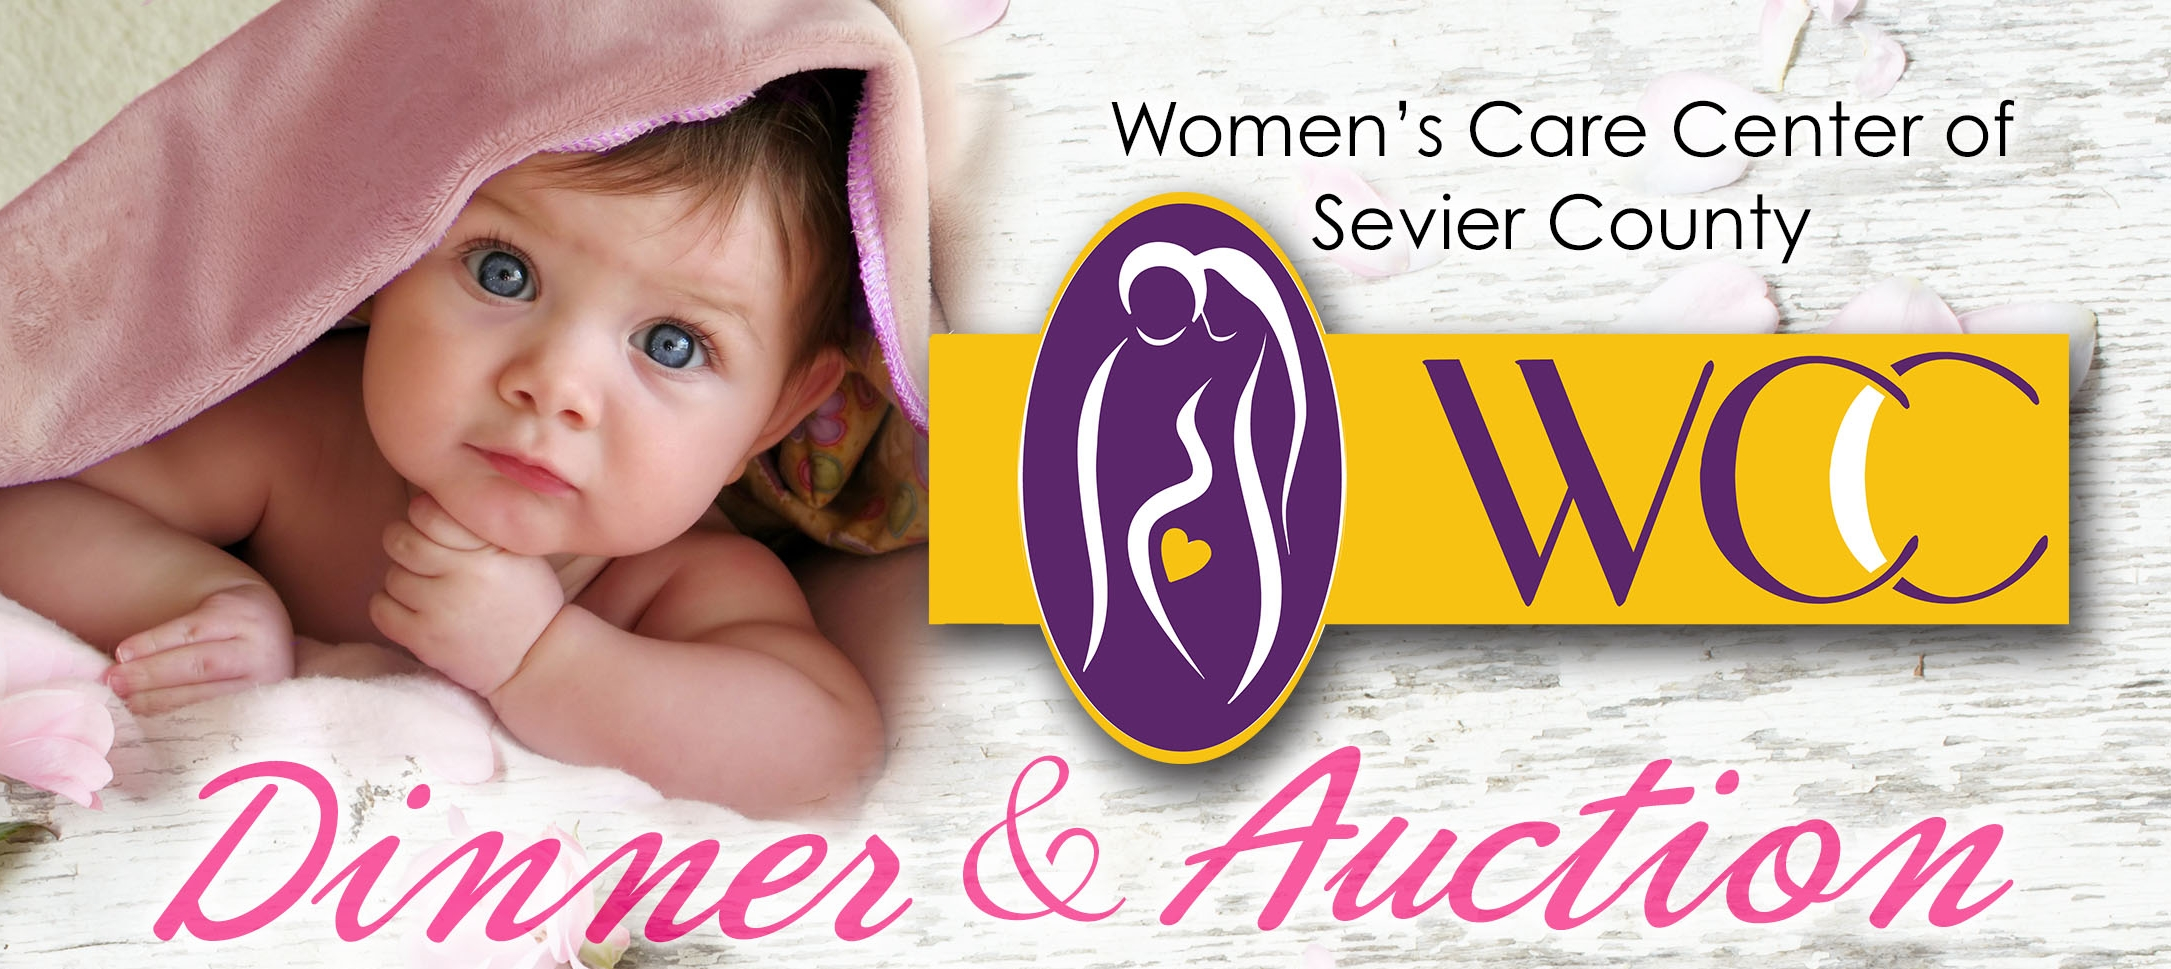 Womens Care Center Invitation 2018 V3.jpg